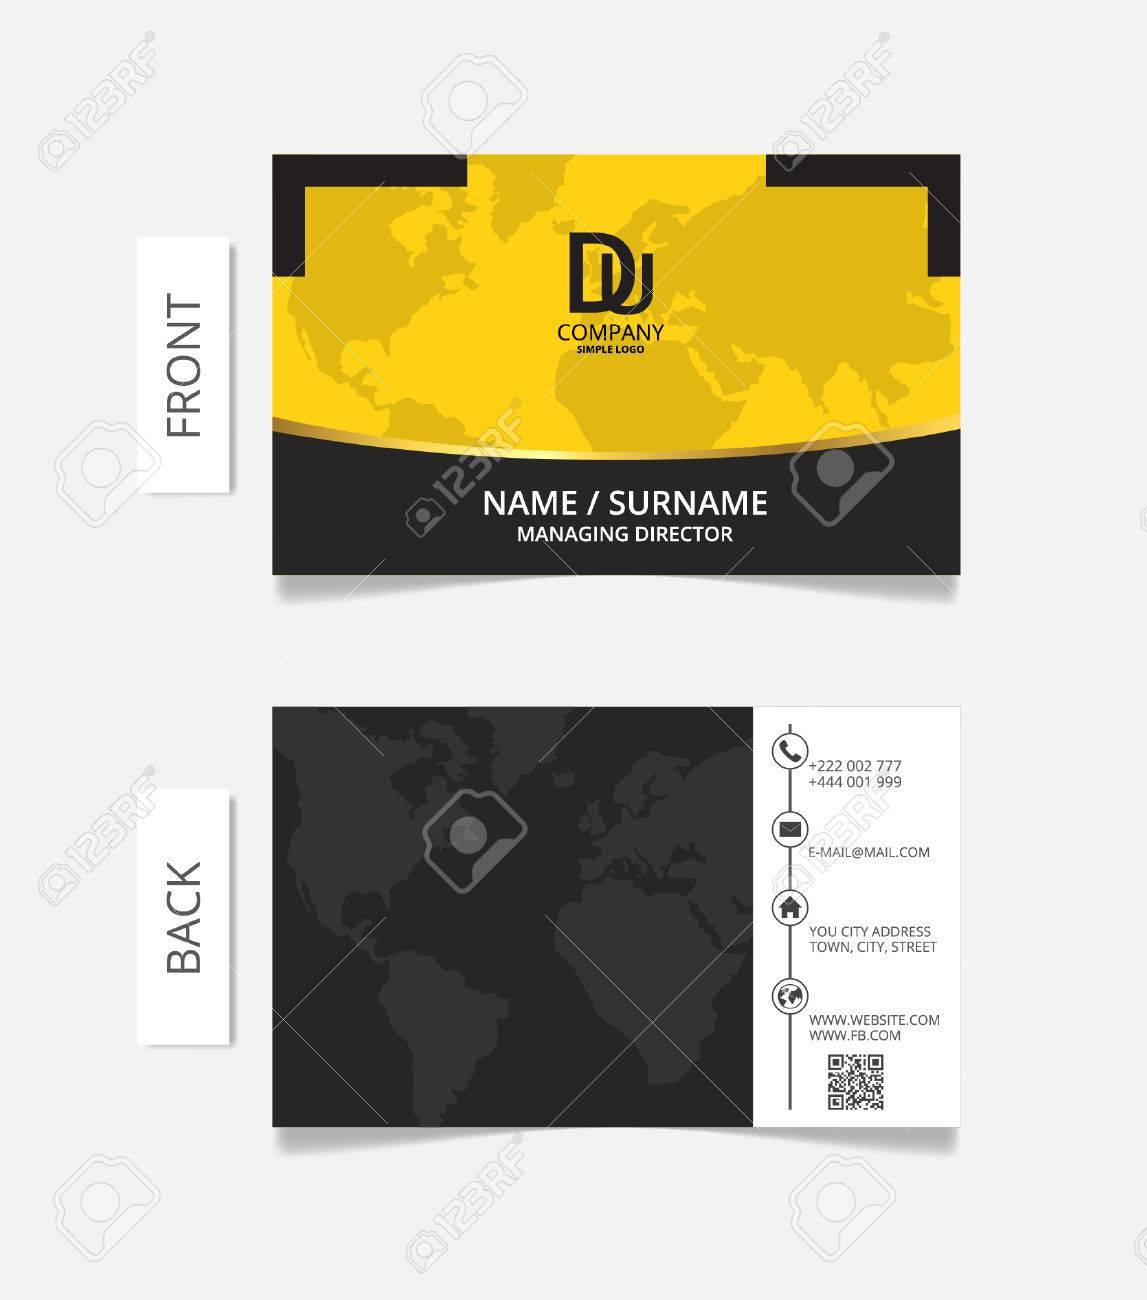 Business Card Modern Design Vector Illustration. Royalty Free ...